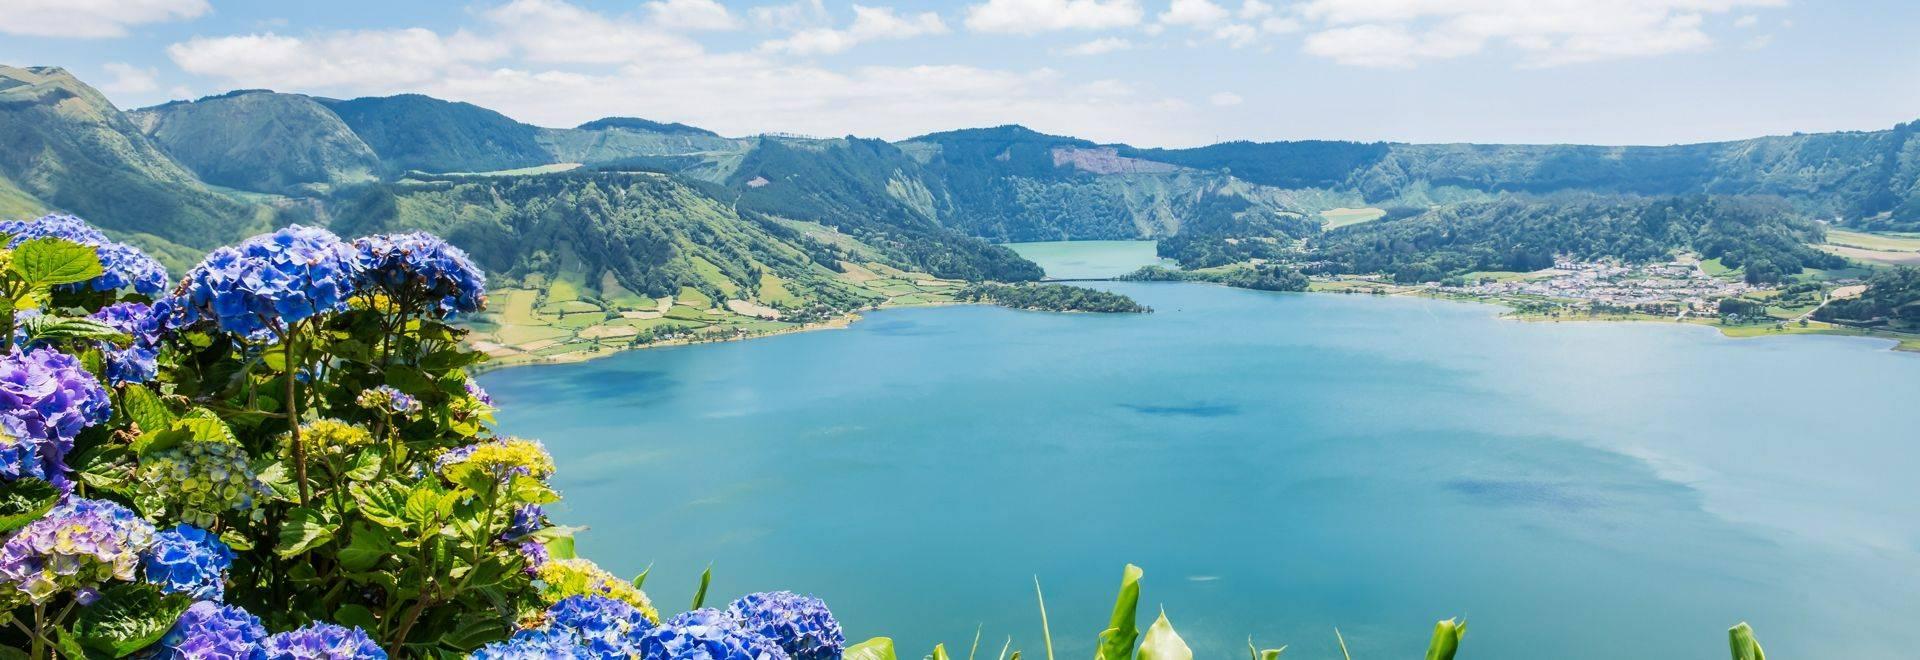 Shutterstock 214920154 Lake Of Sete Cidades